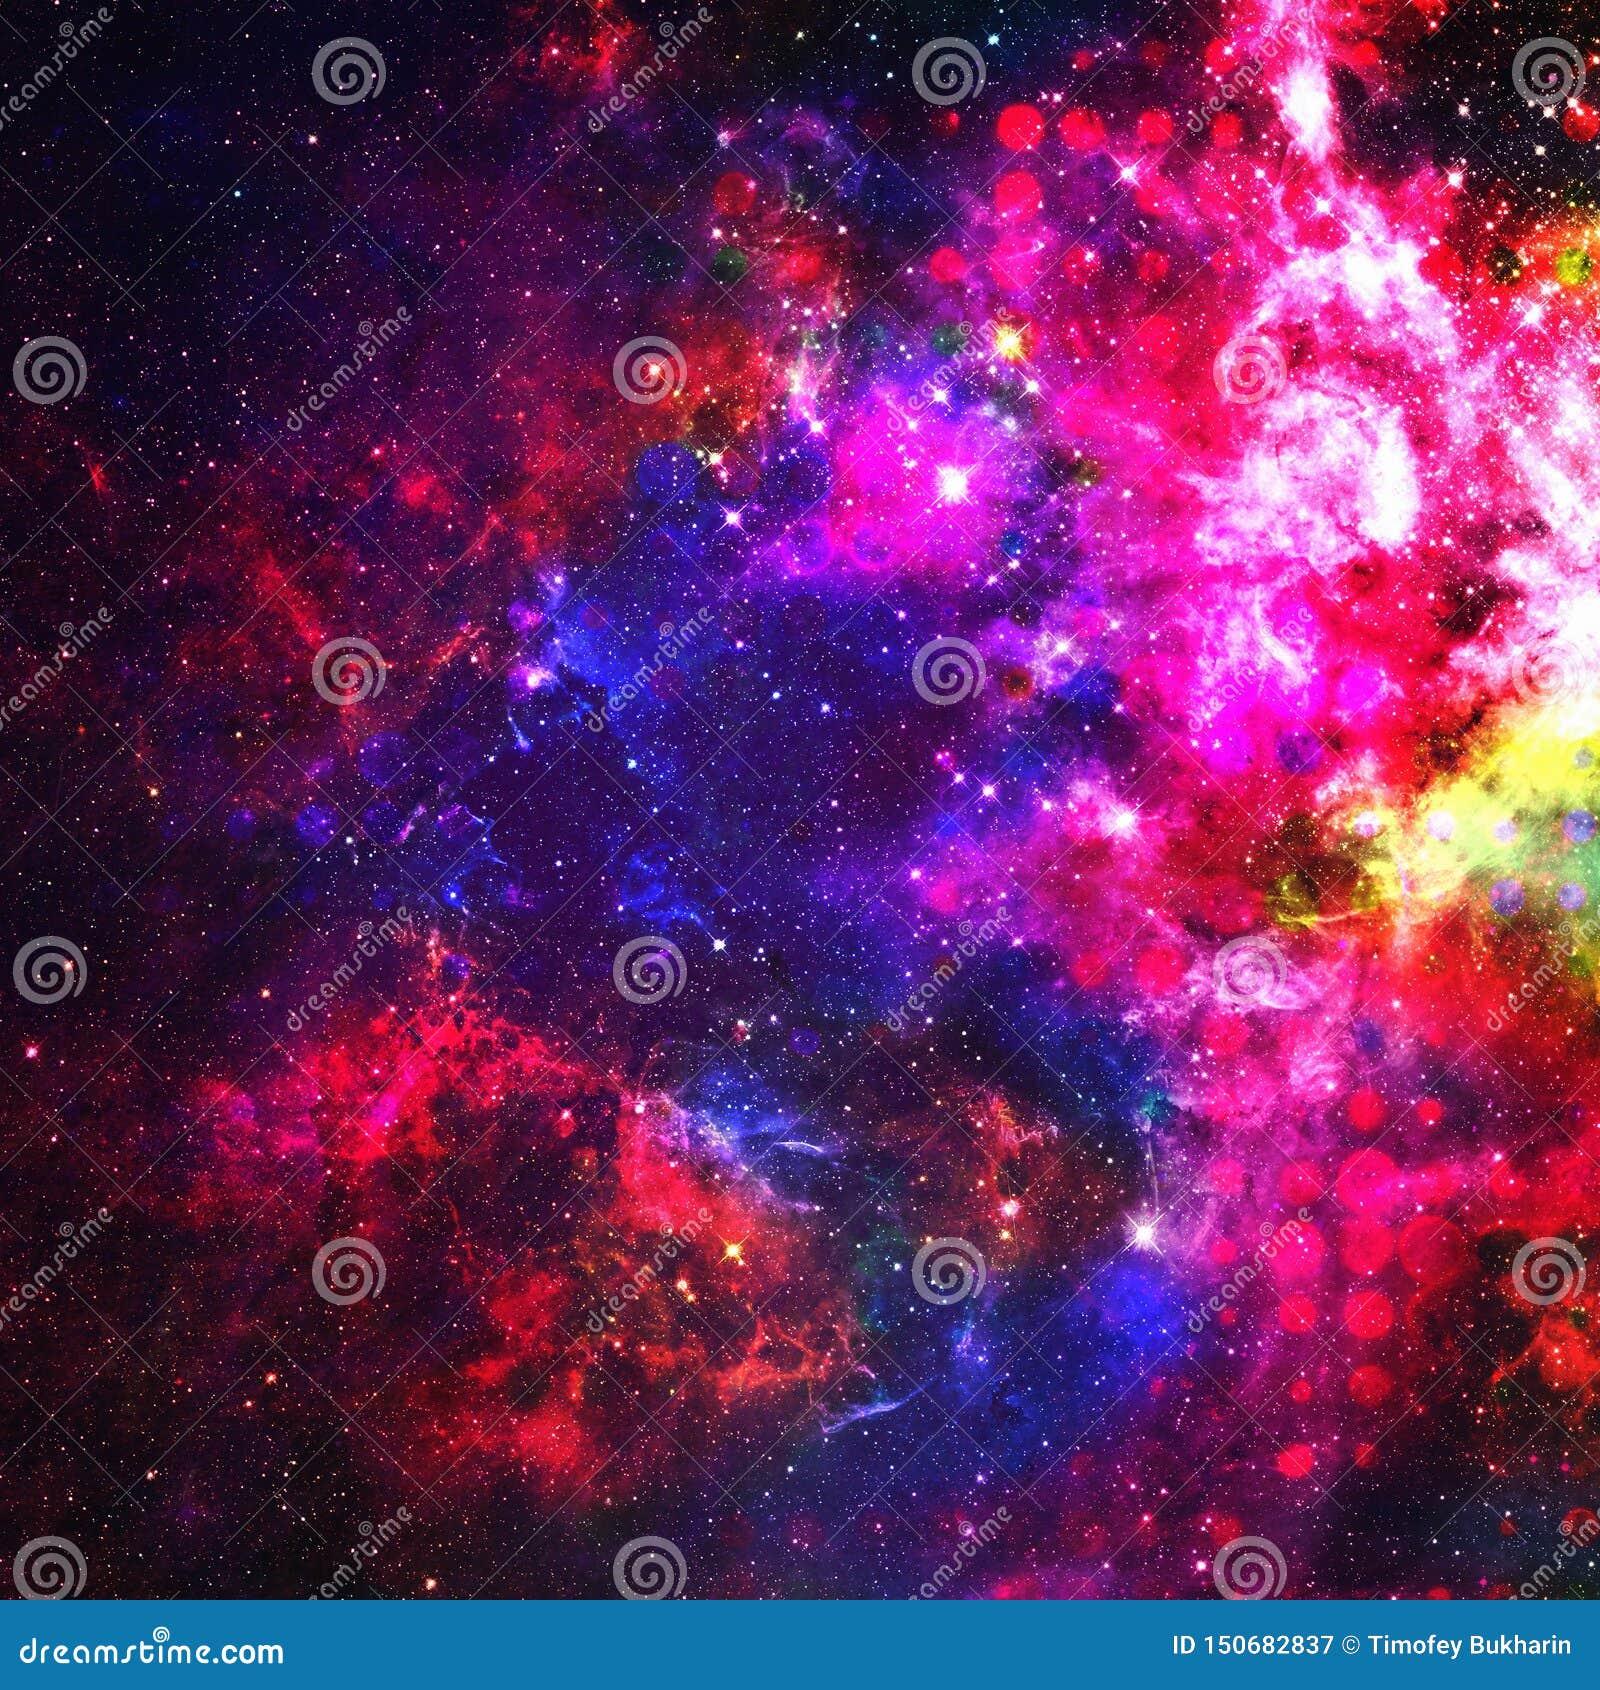 4k Resolution Neon Wallpaper Hd April 2011